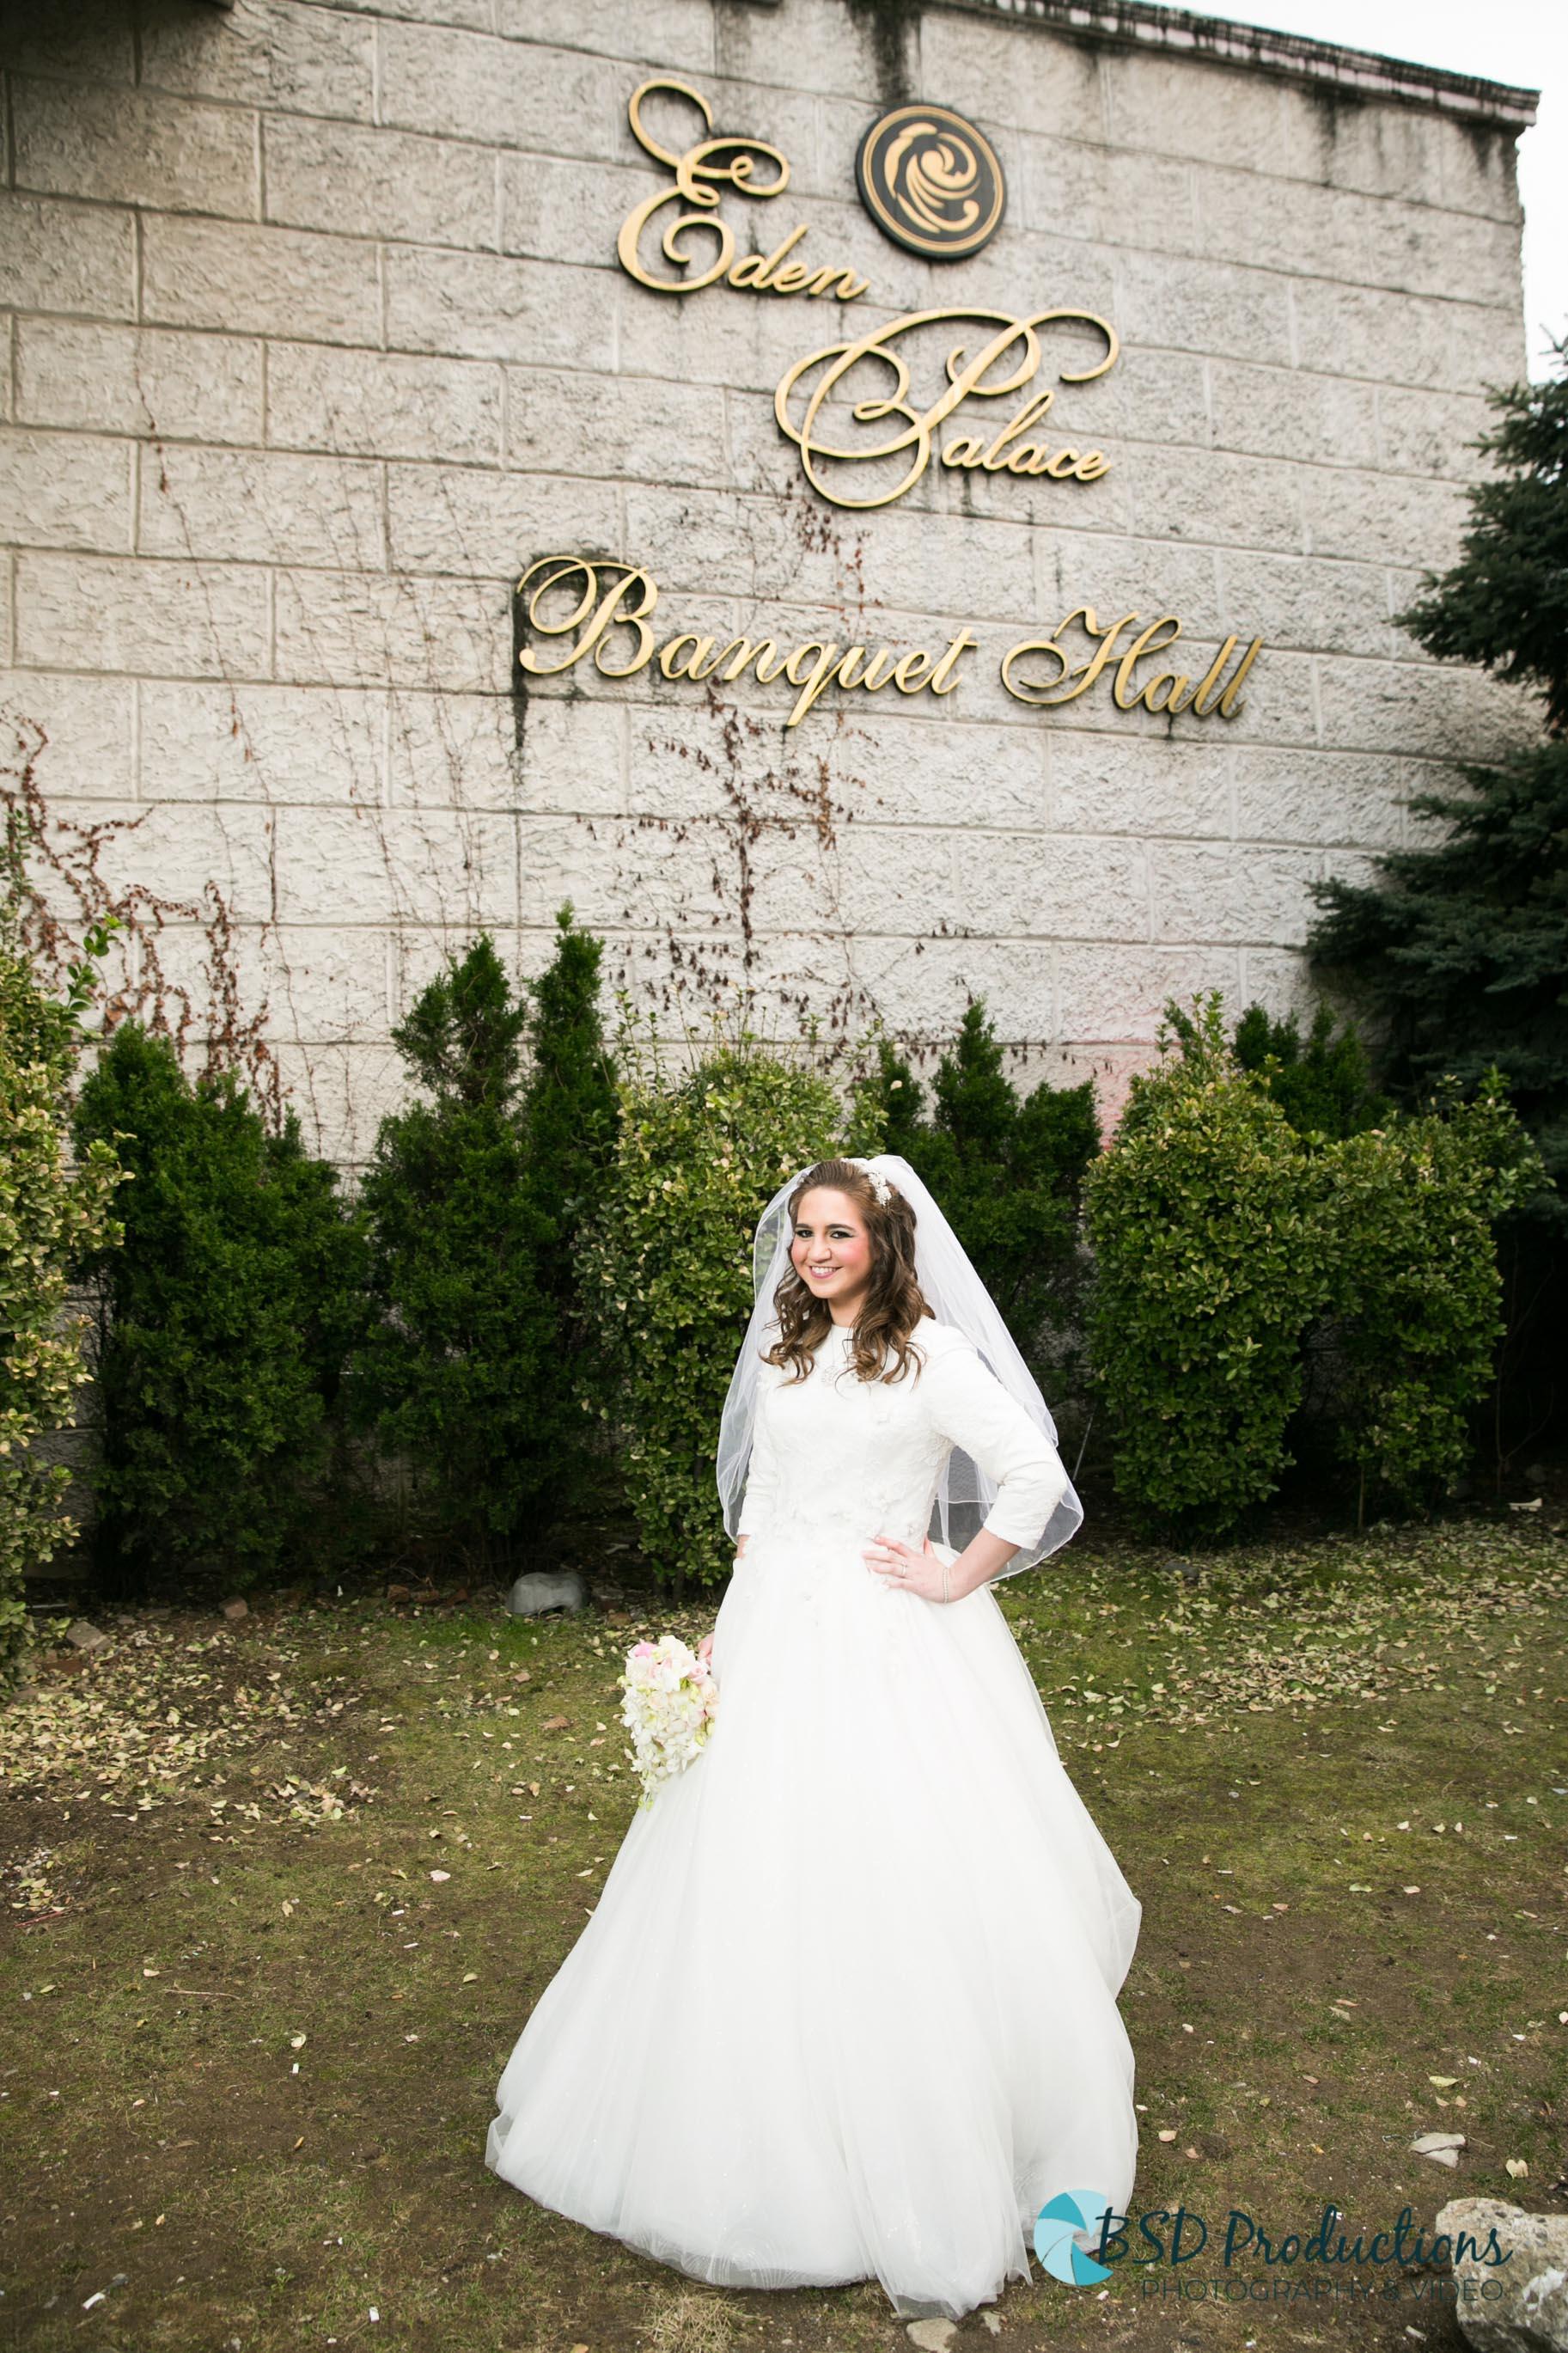 UH5A8090 Wedding – BSD Prodcutions Photography